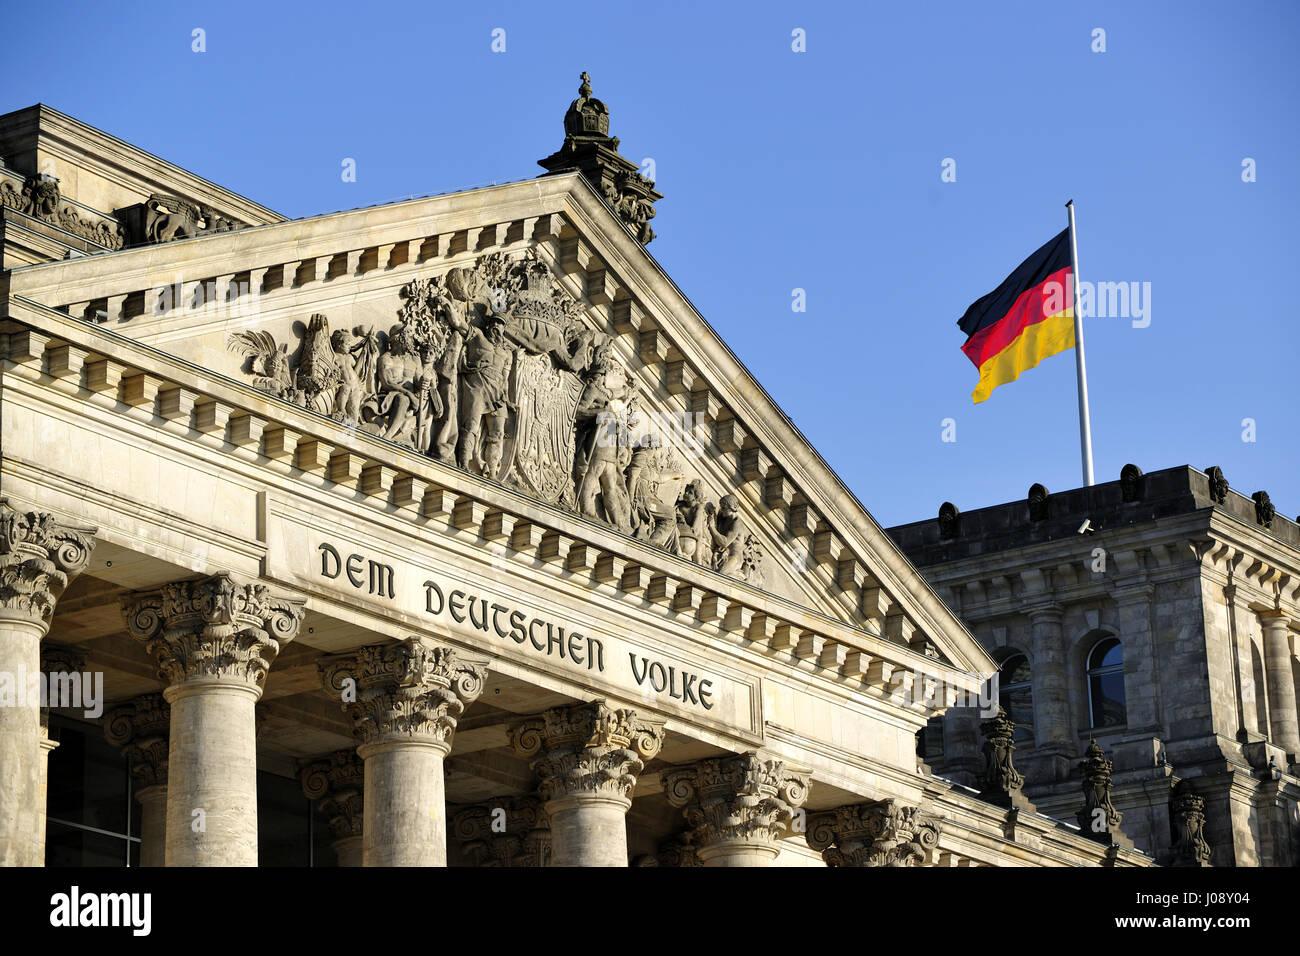 architecture, berlin, building, bundestag, capital, center, city, classic, columns, congress, culture, day, destinations, - Stock Image